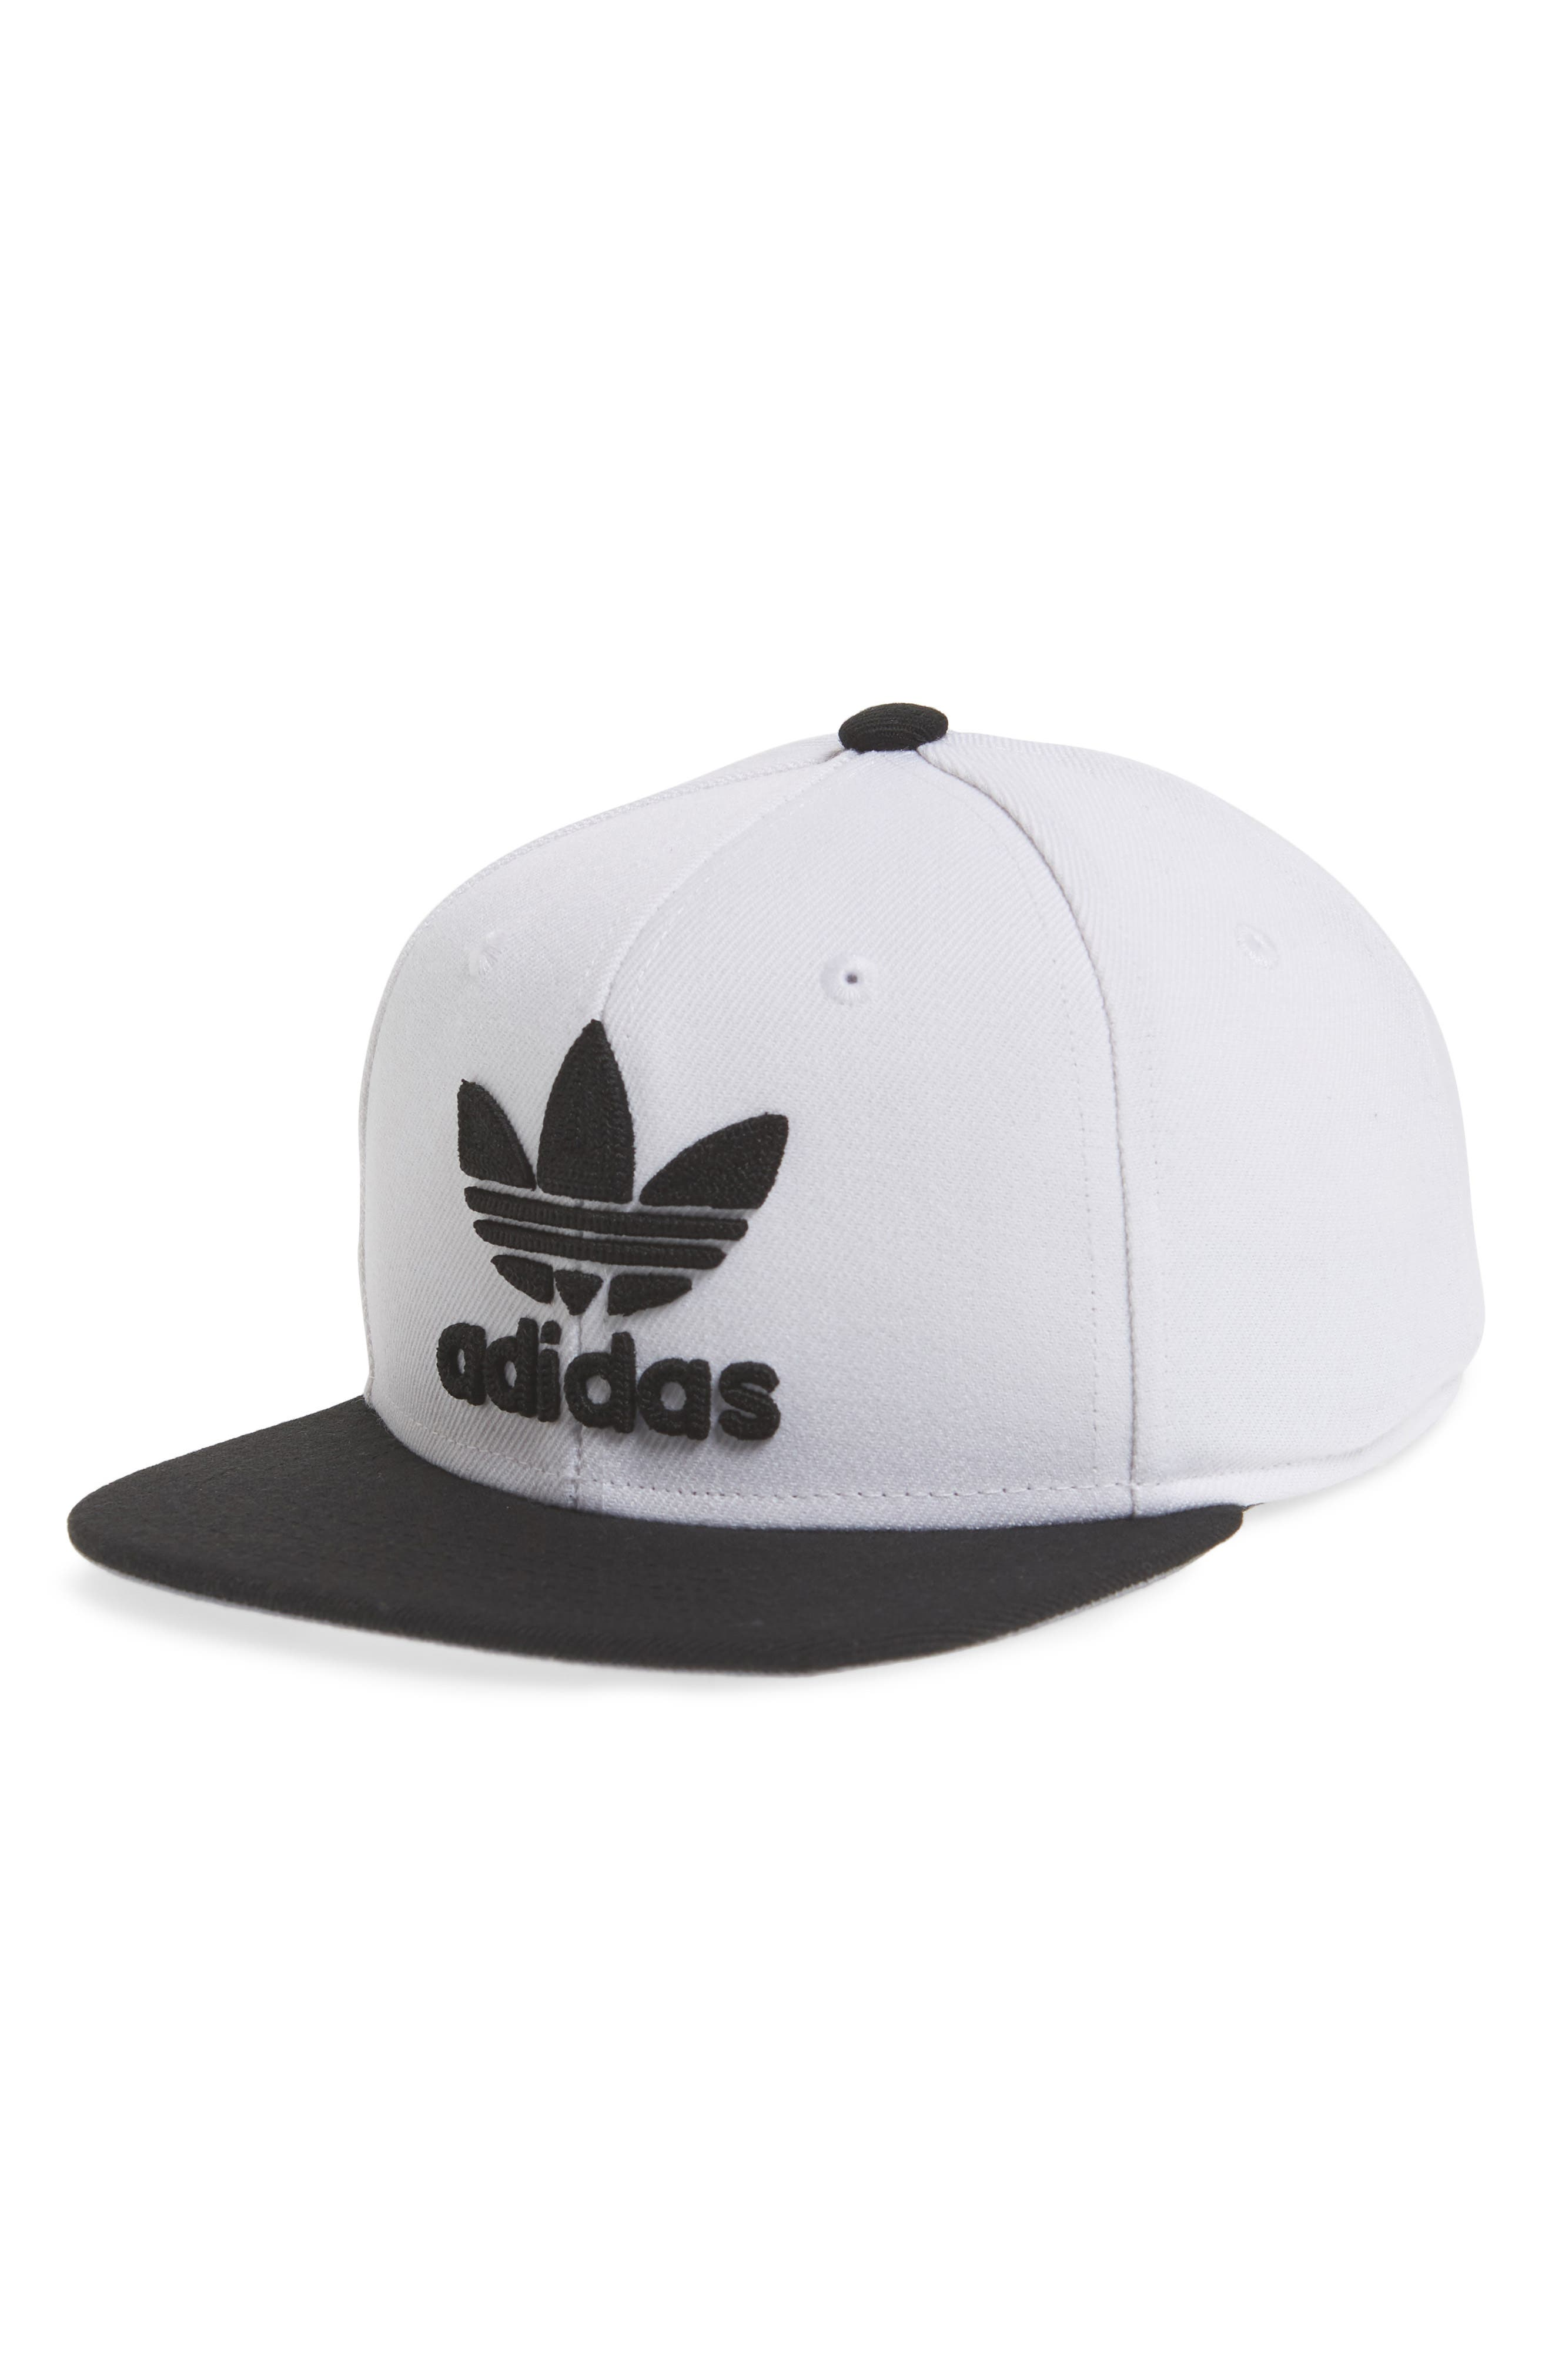 Alternate Image 1 Selected - adidas Originals Snapback Hat (Boys)